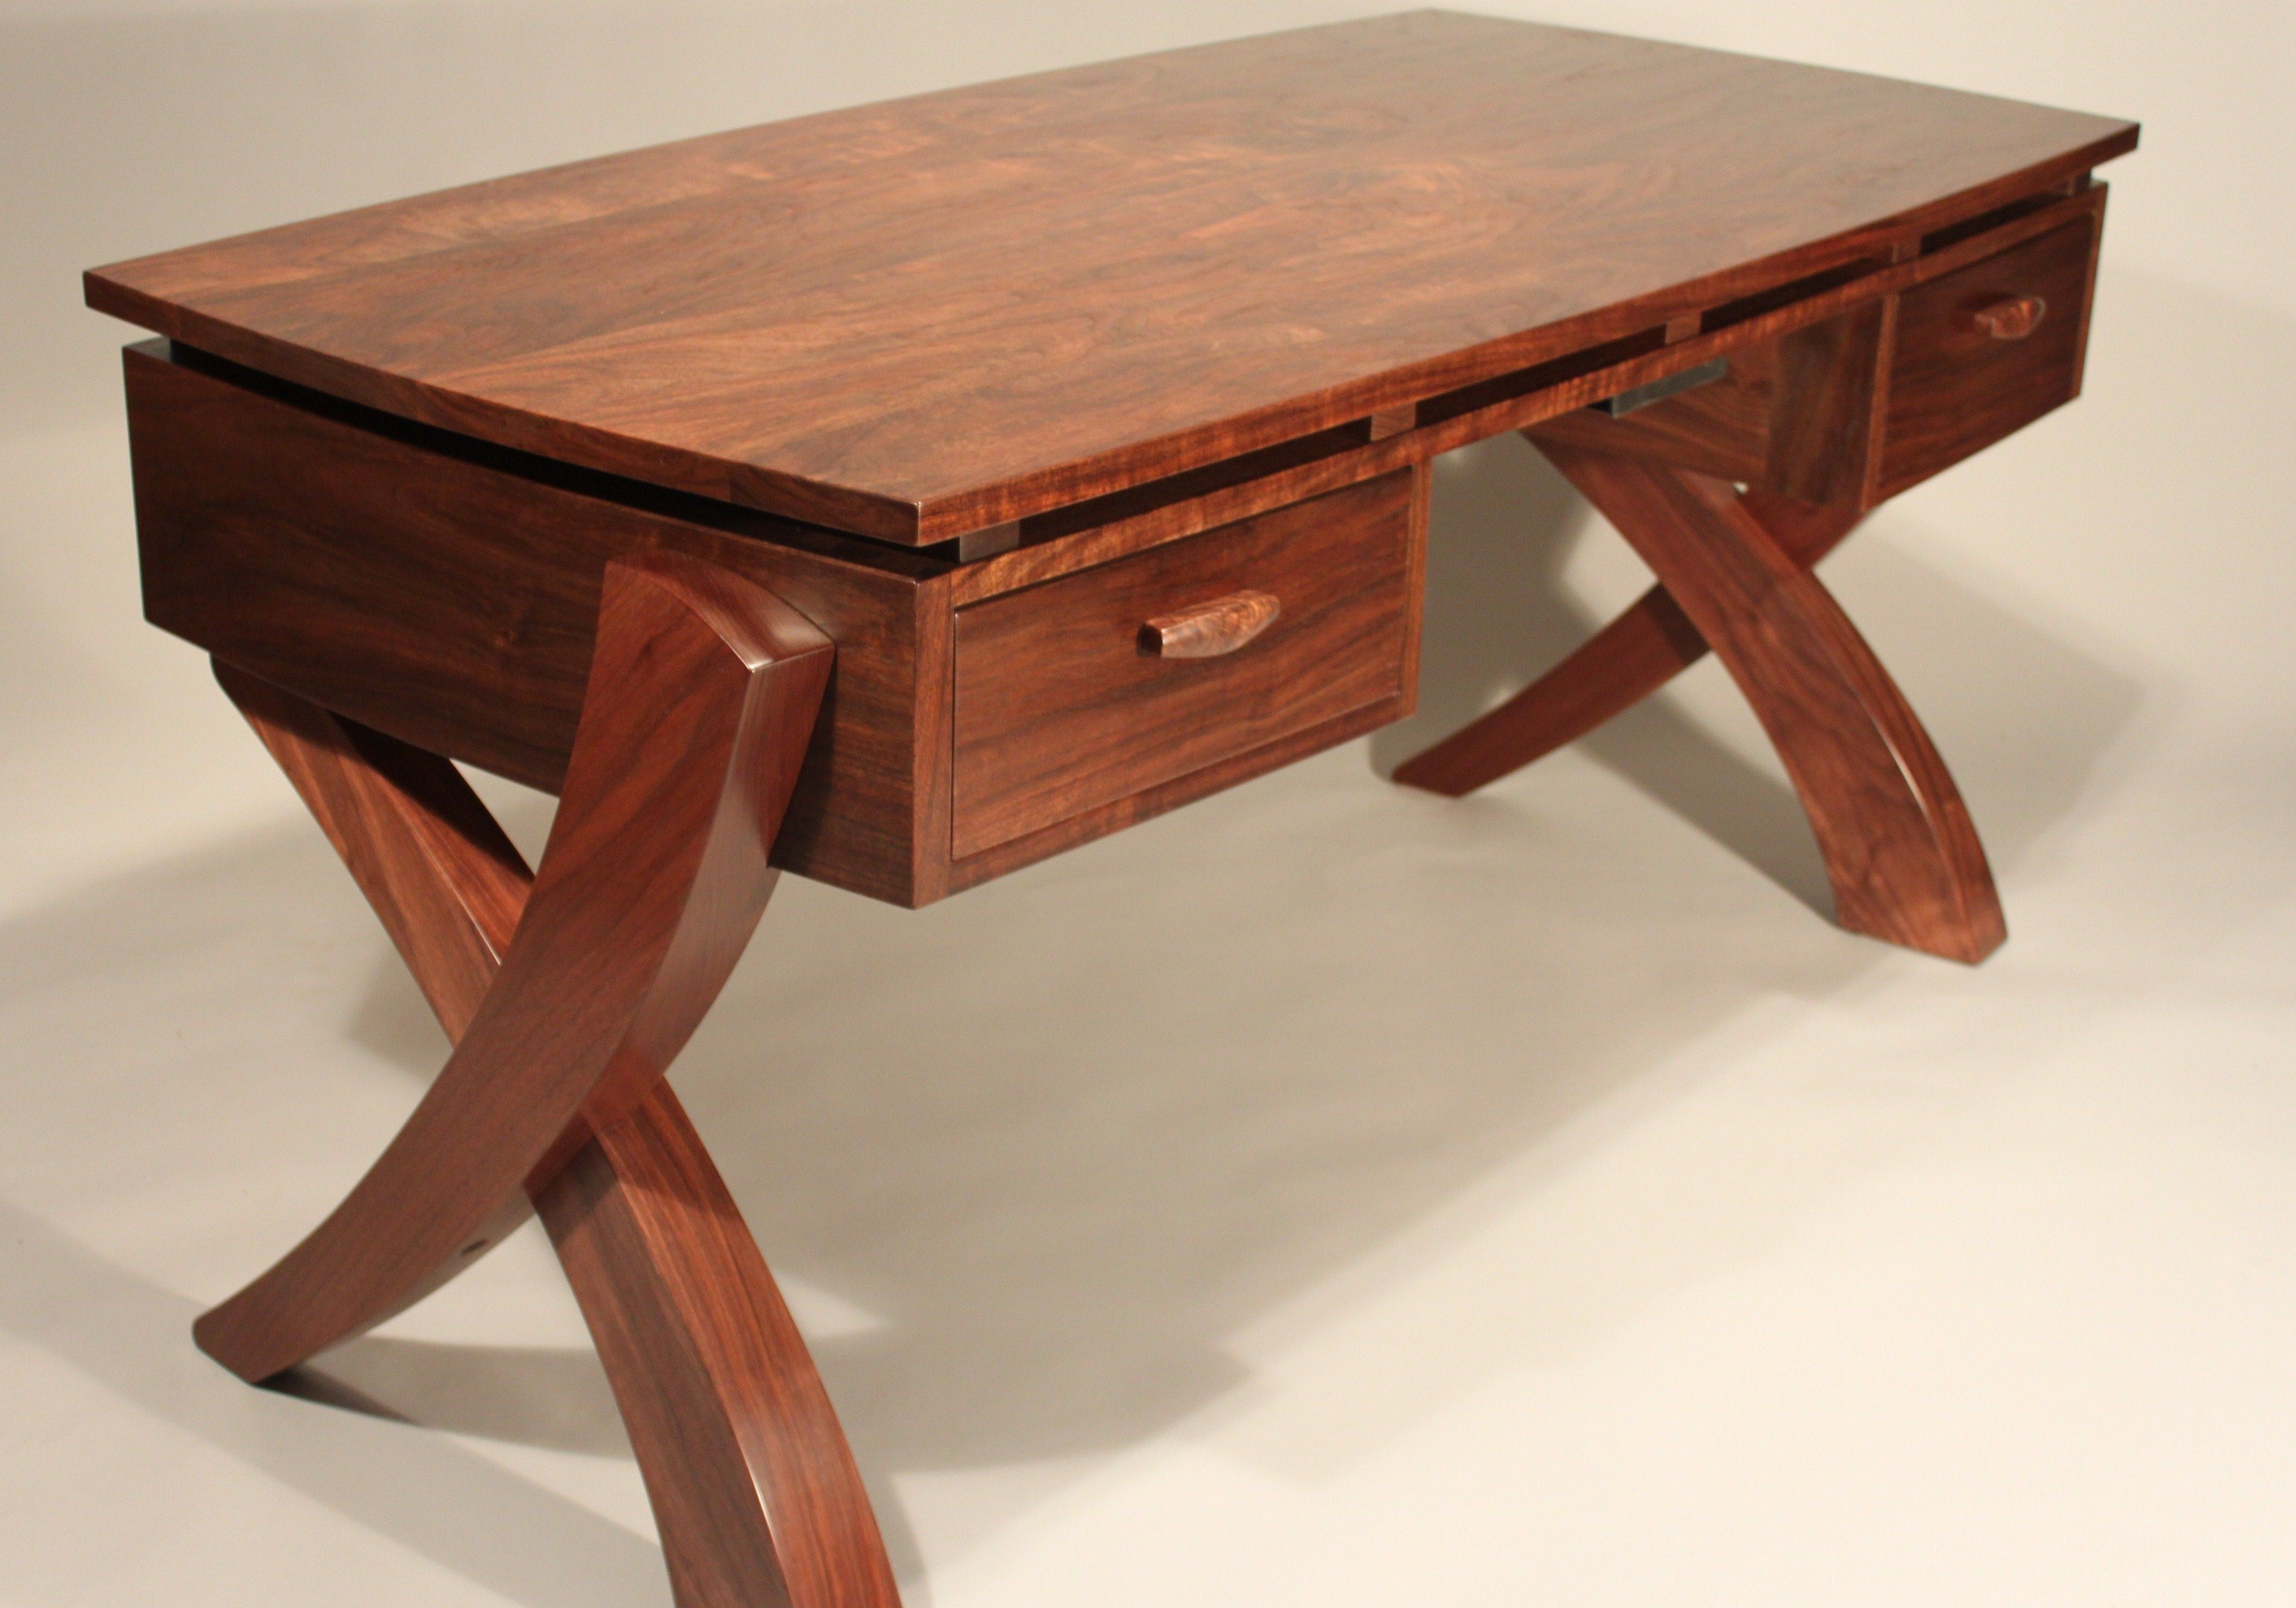 The Campaign Desk Bringing Back Historic Furniture Style